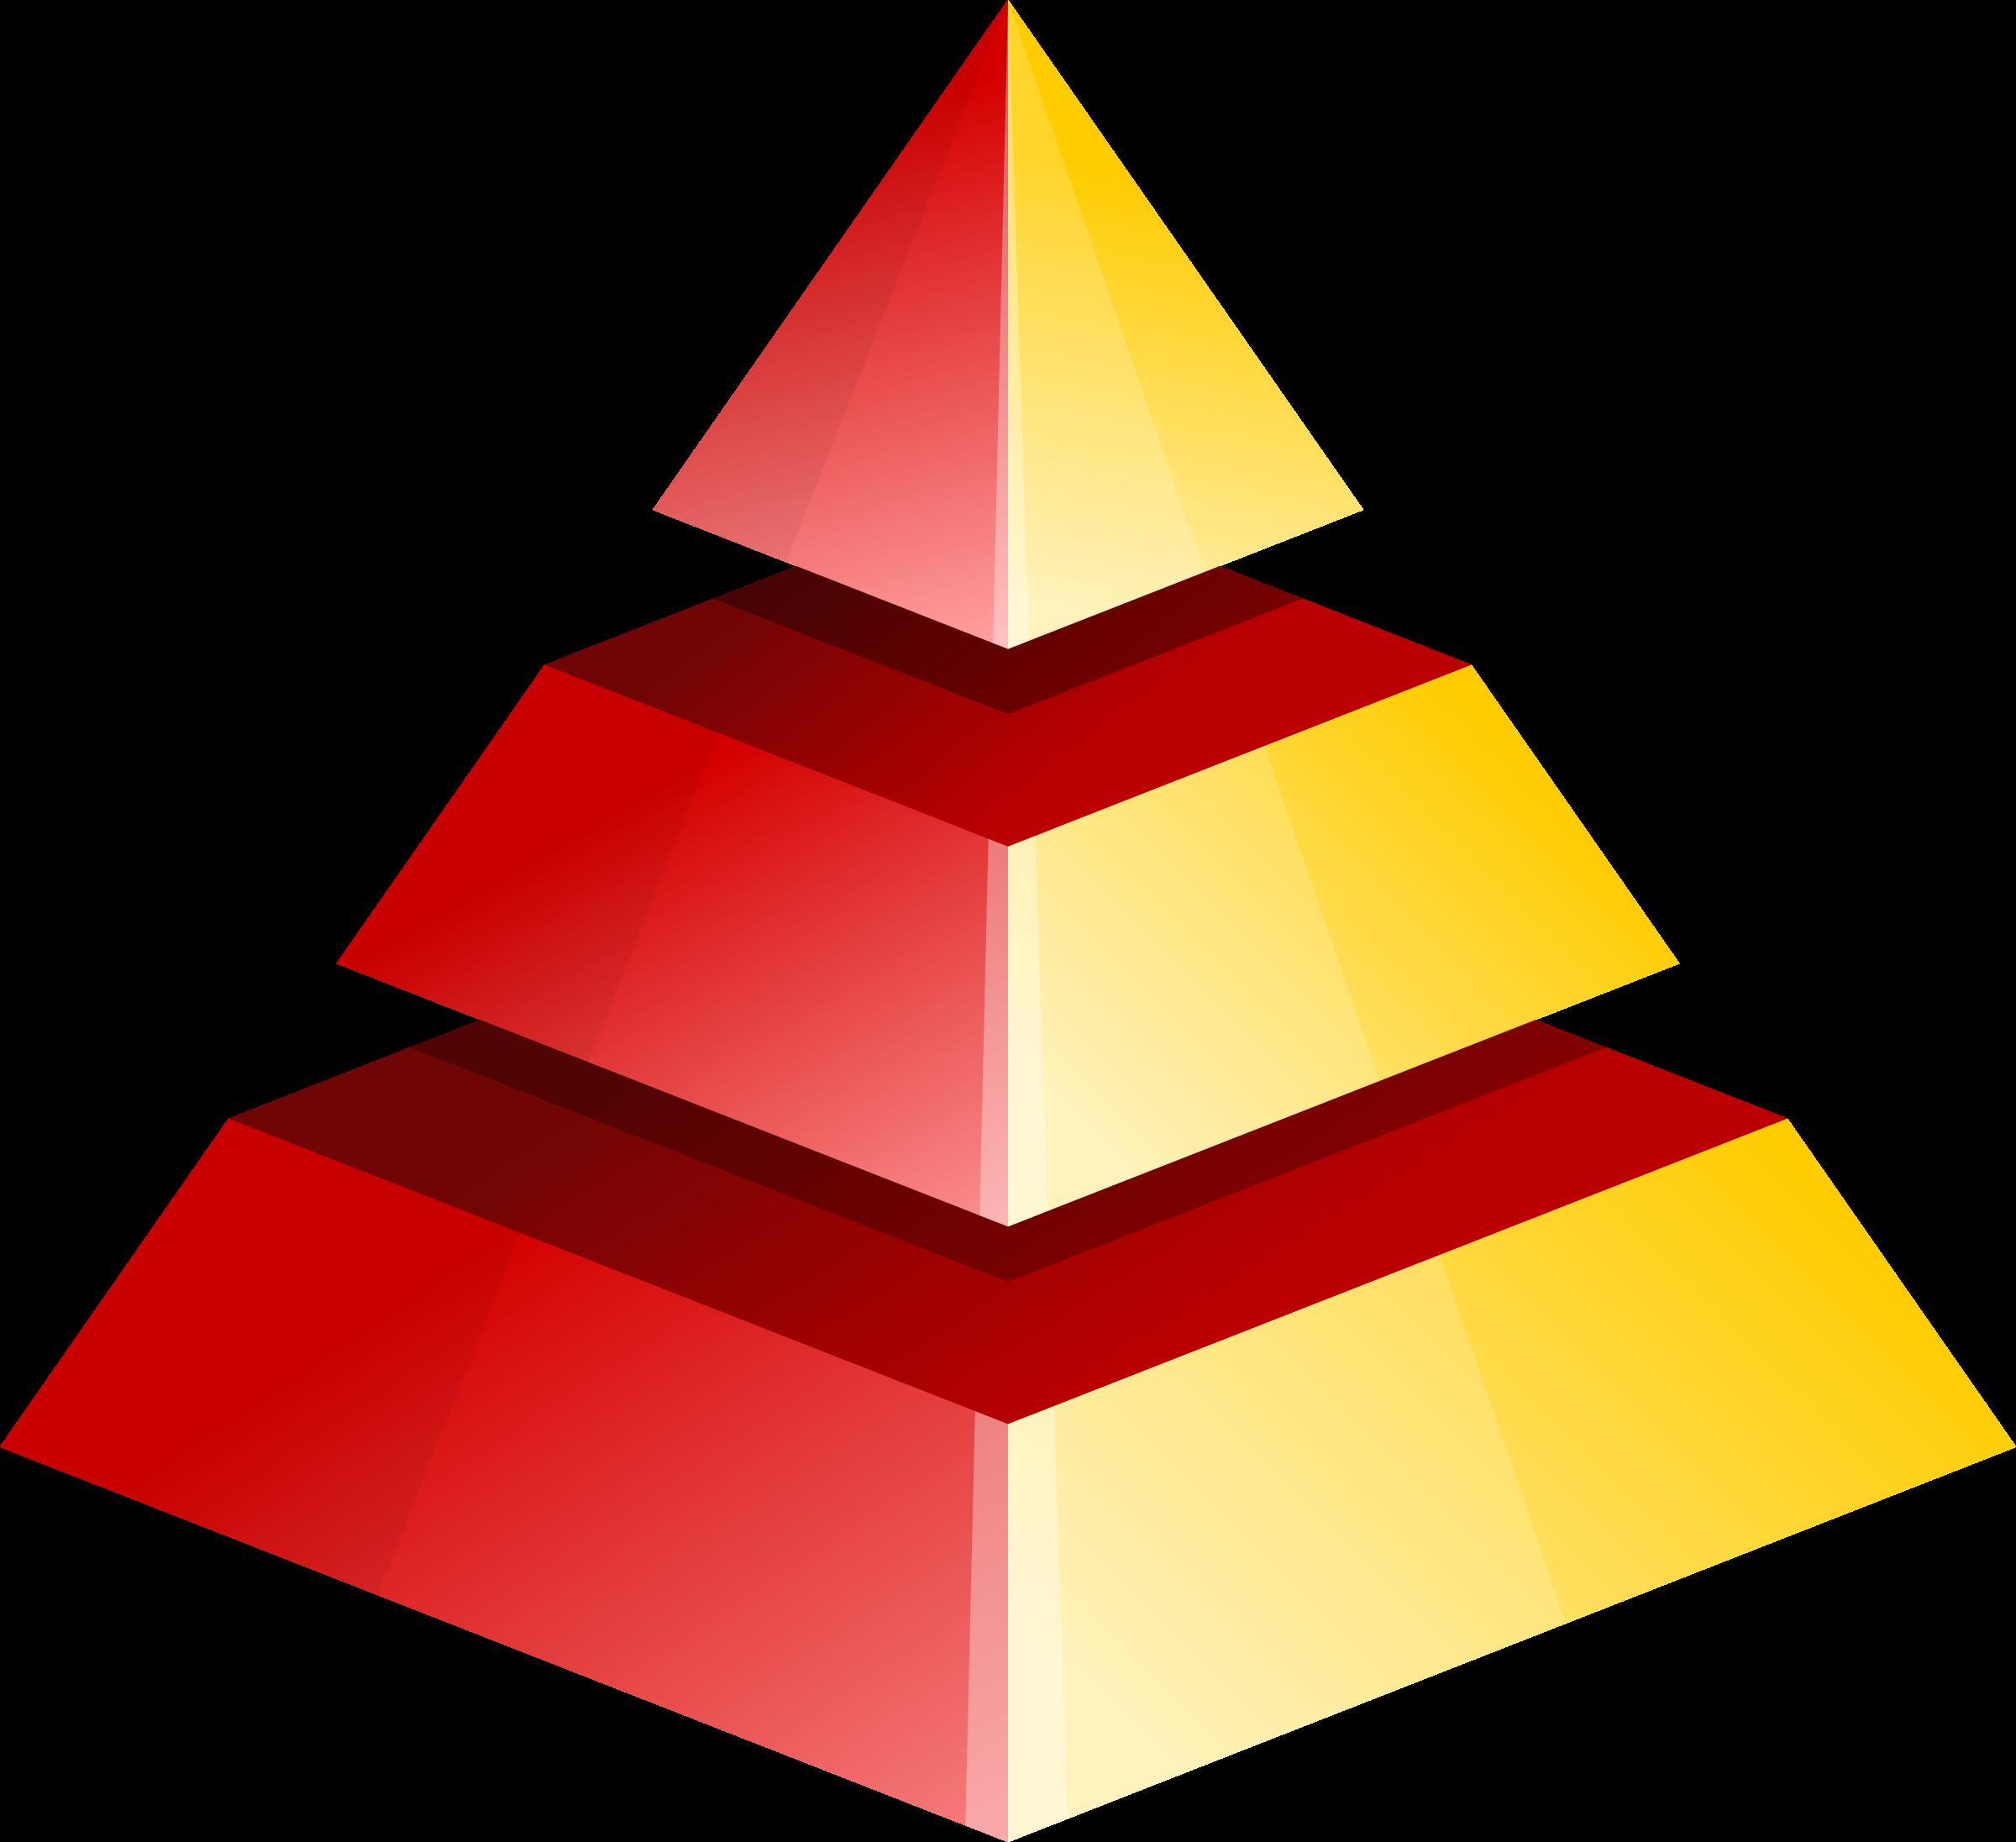 clip art library Pyramids clipart artwork. Pyramid